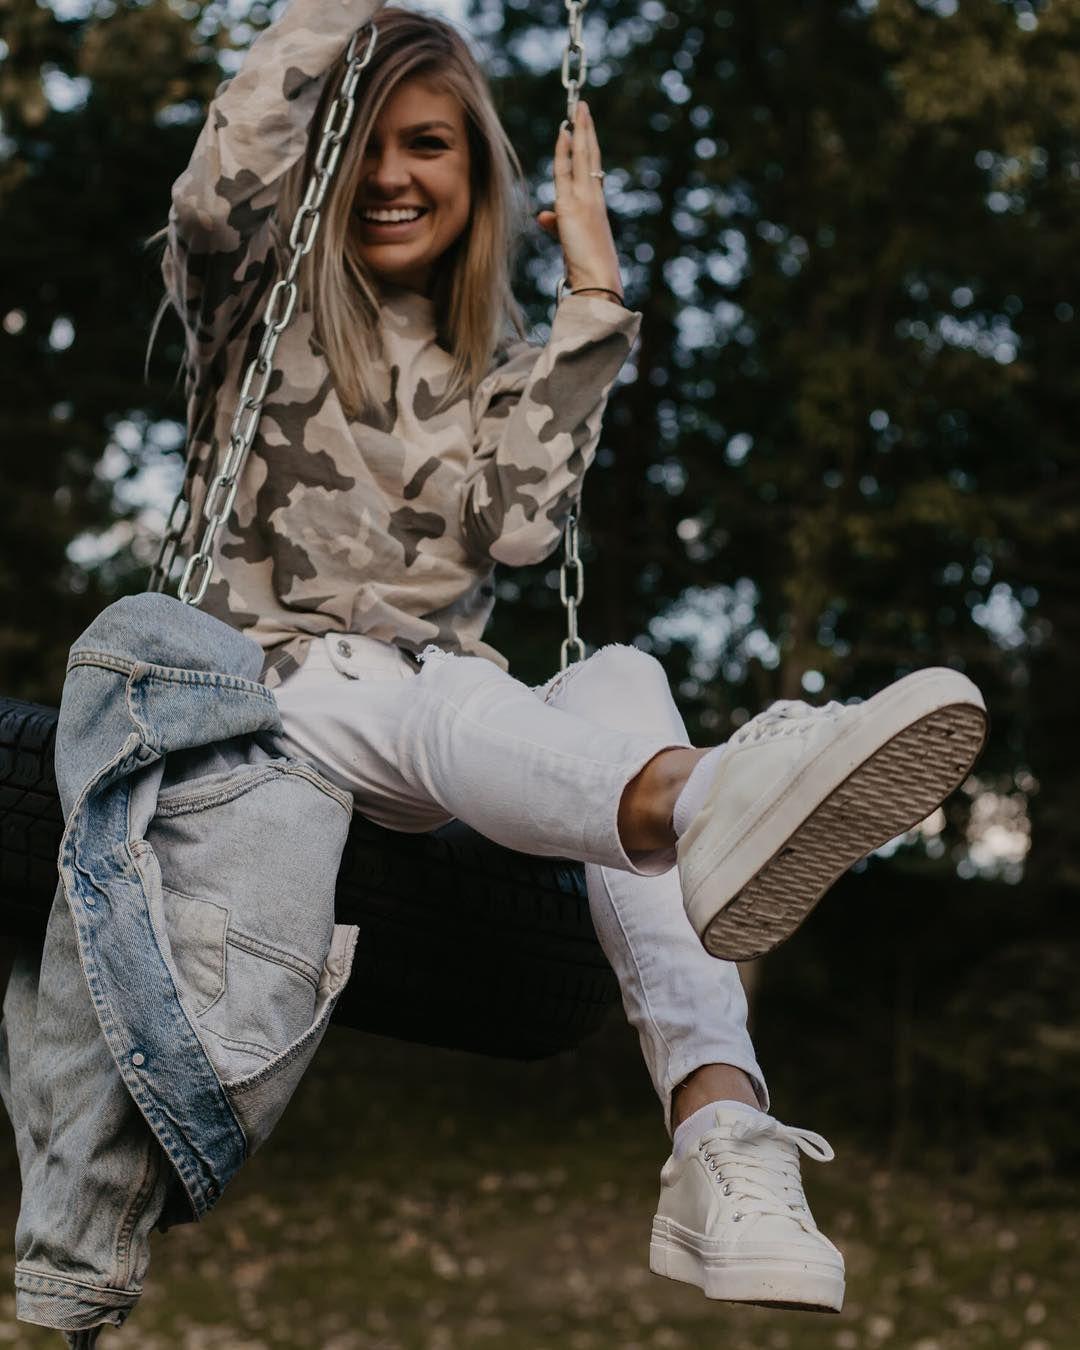 e25b0fa83e Milkyway Slick White Platform Sneaker in 2019 | Rocket Dog Rockstars ...